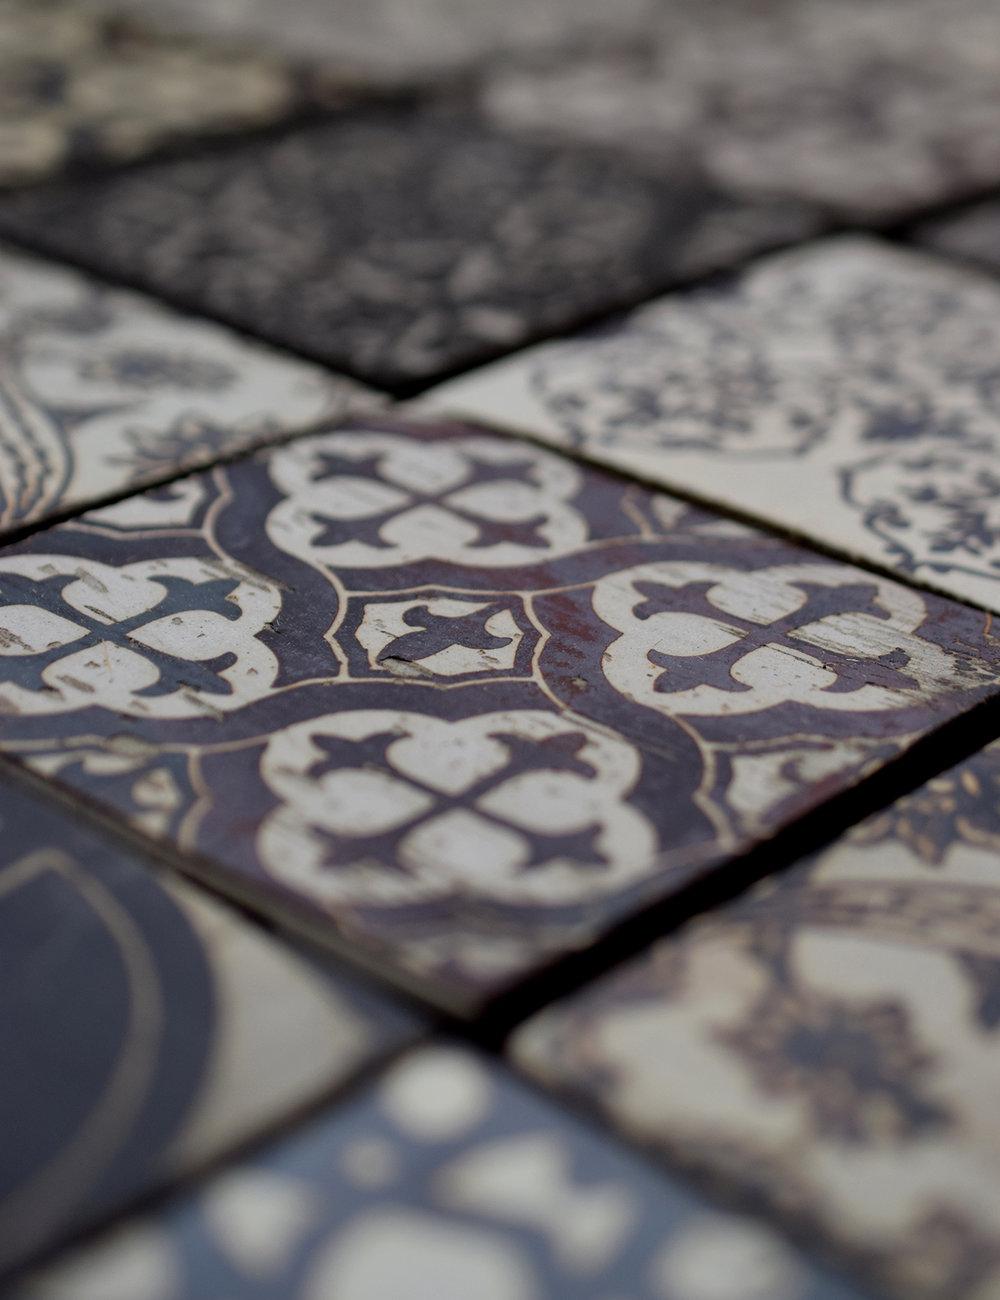 Variegated Tiles